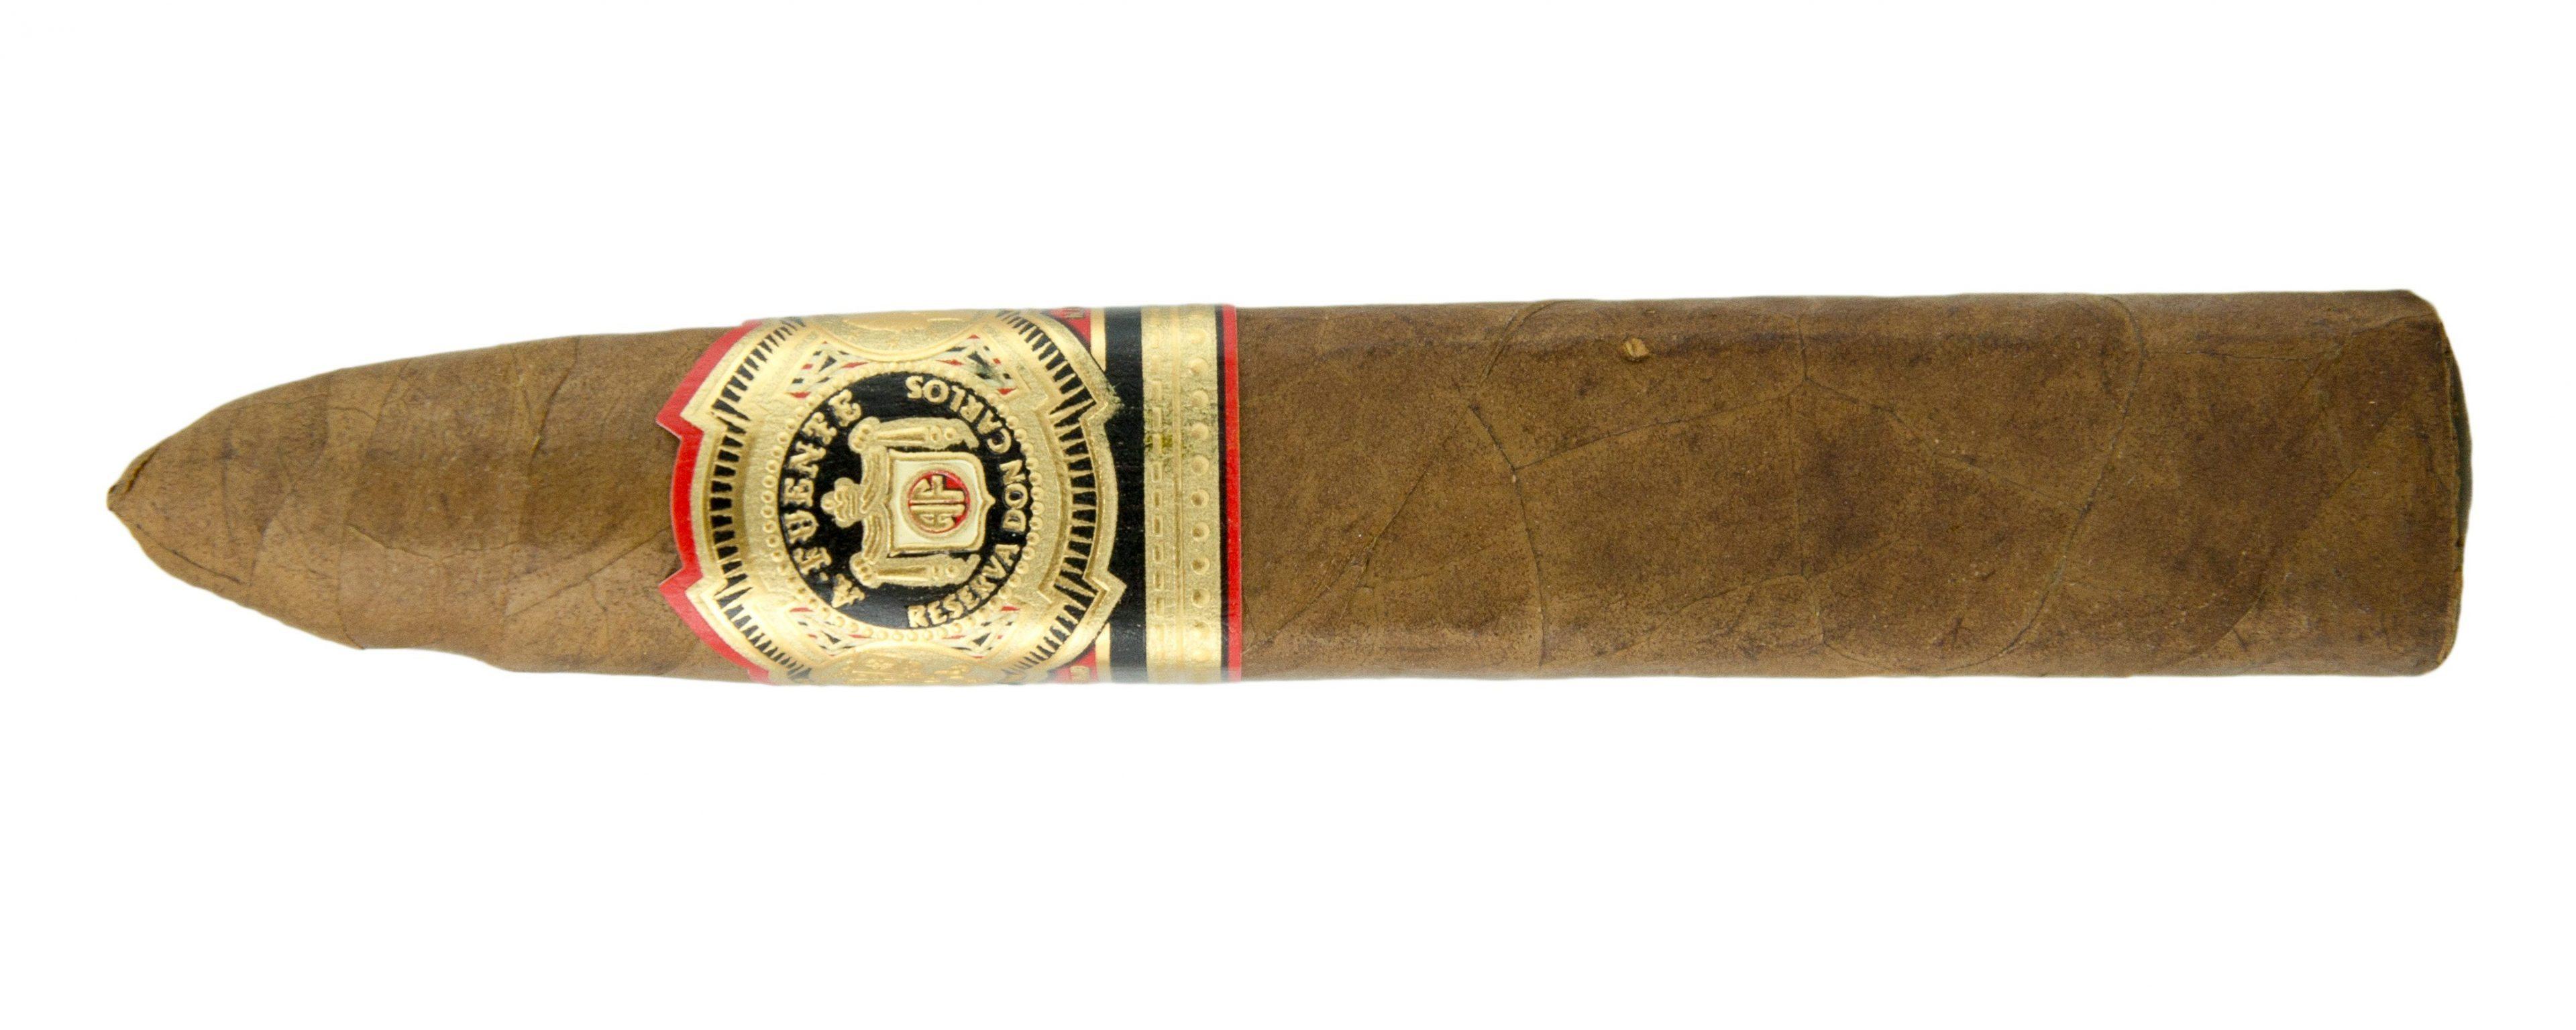 Quick Cigar Review: Arturo Fuente | Don Carlos Eye of the Shark